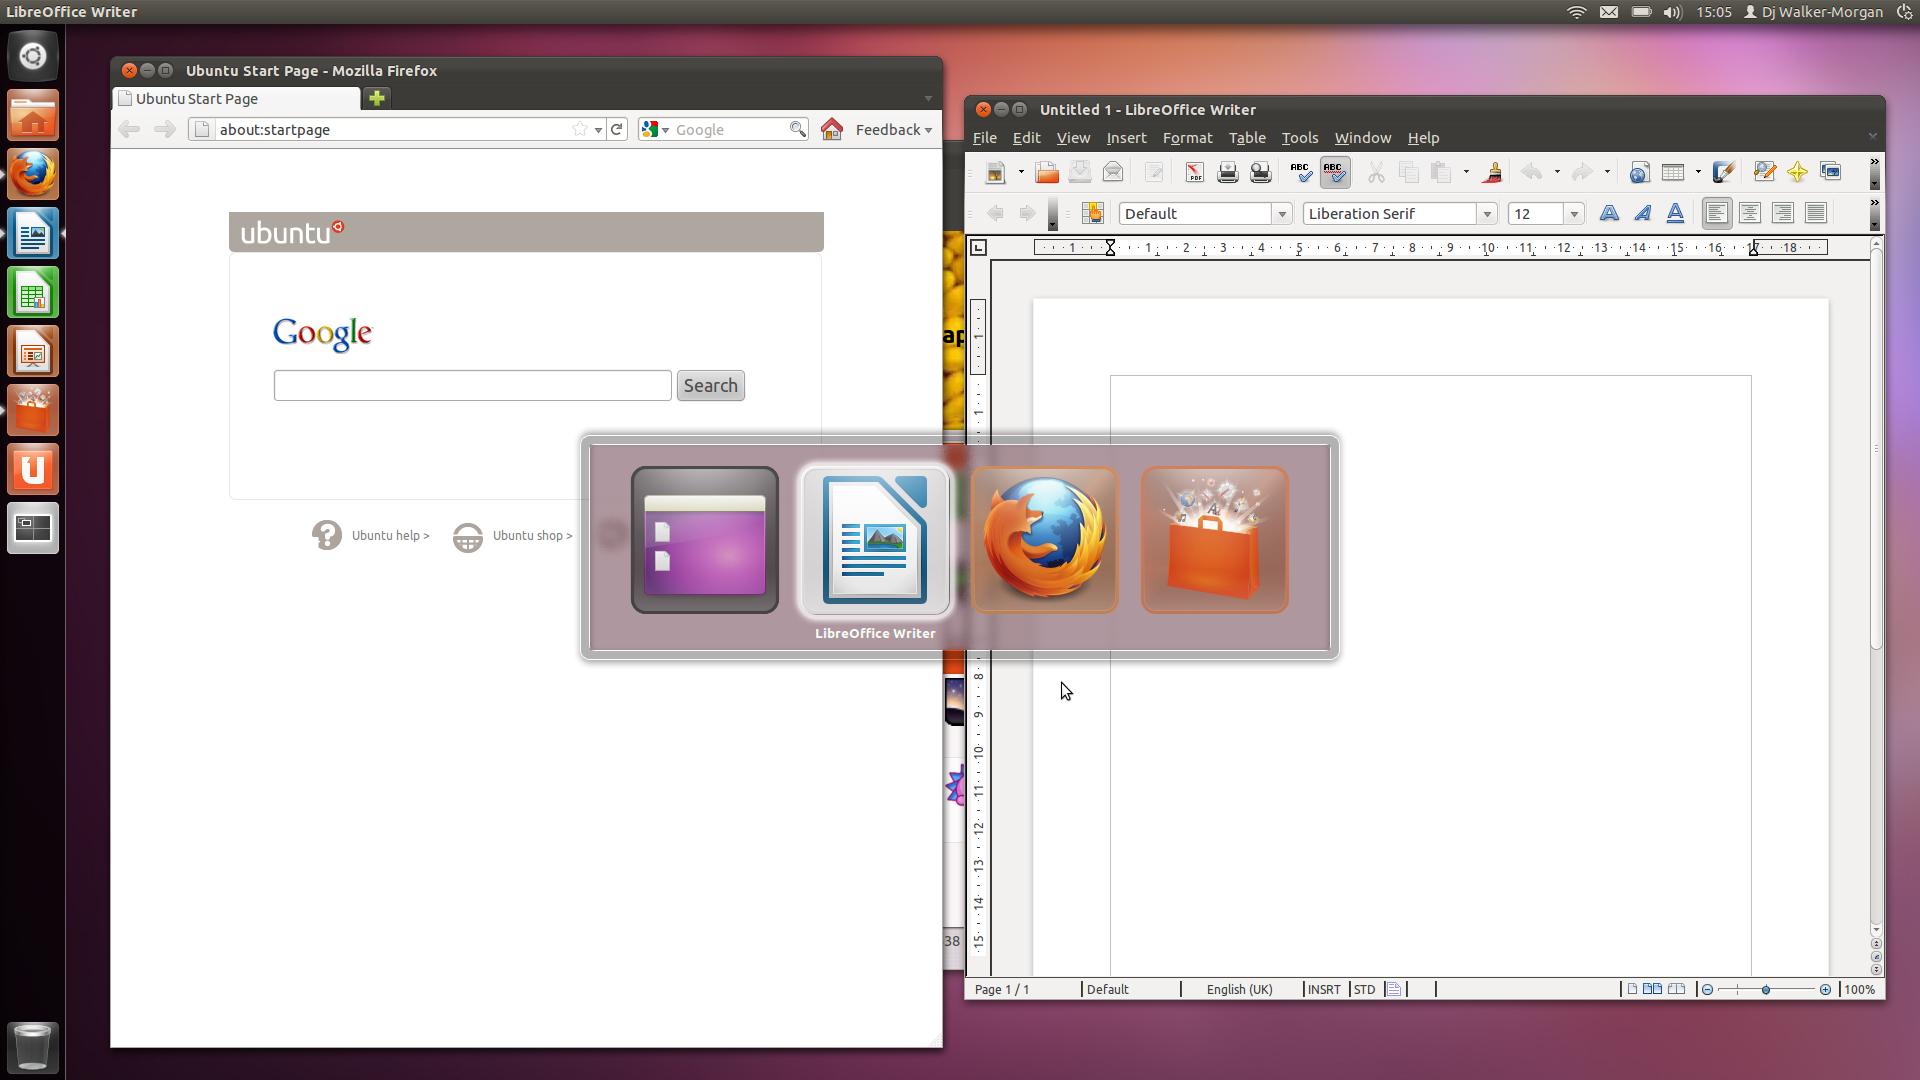 Ubuntu_11.10_Beta_1-b7a7e567a475de13